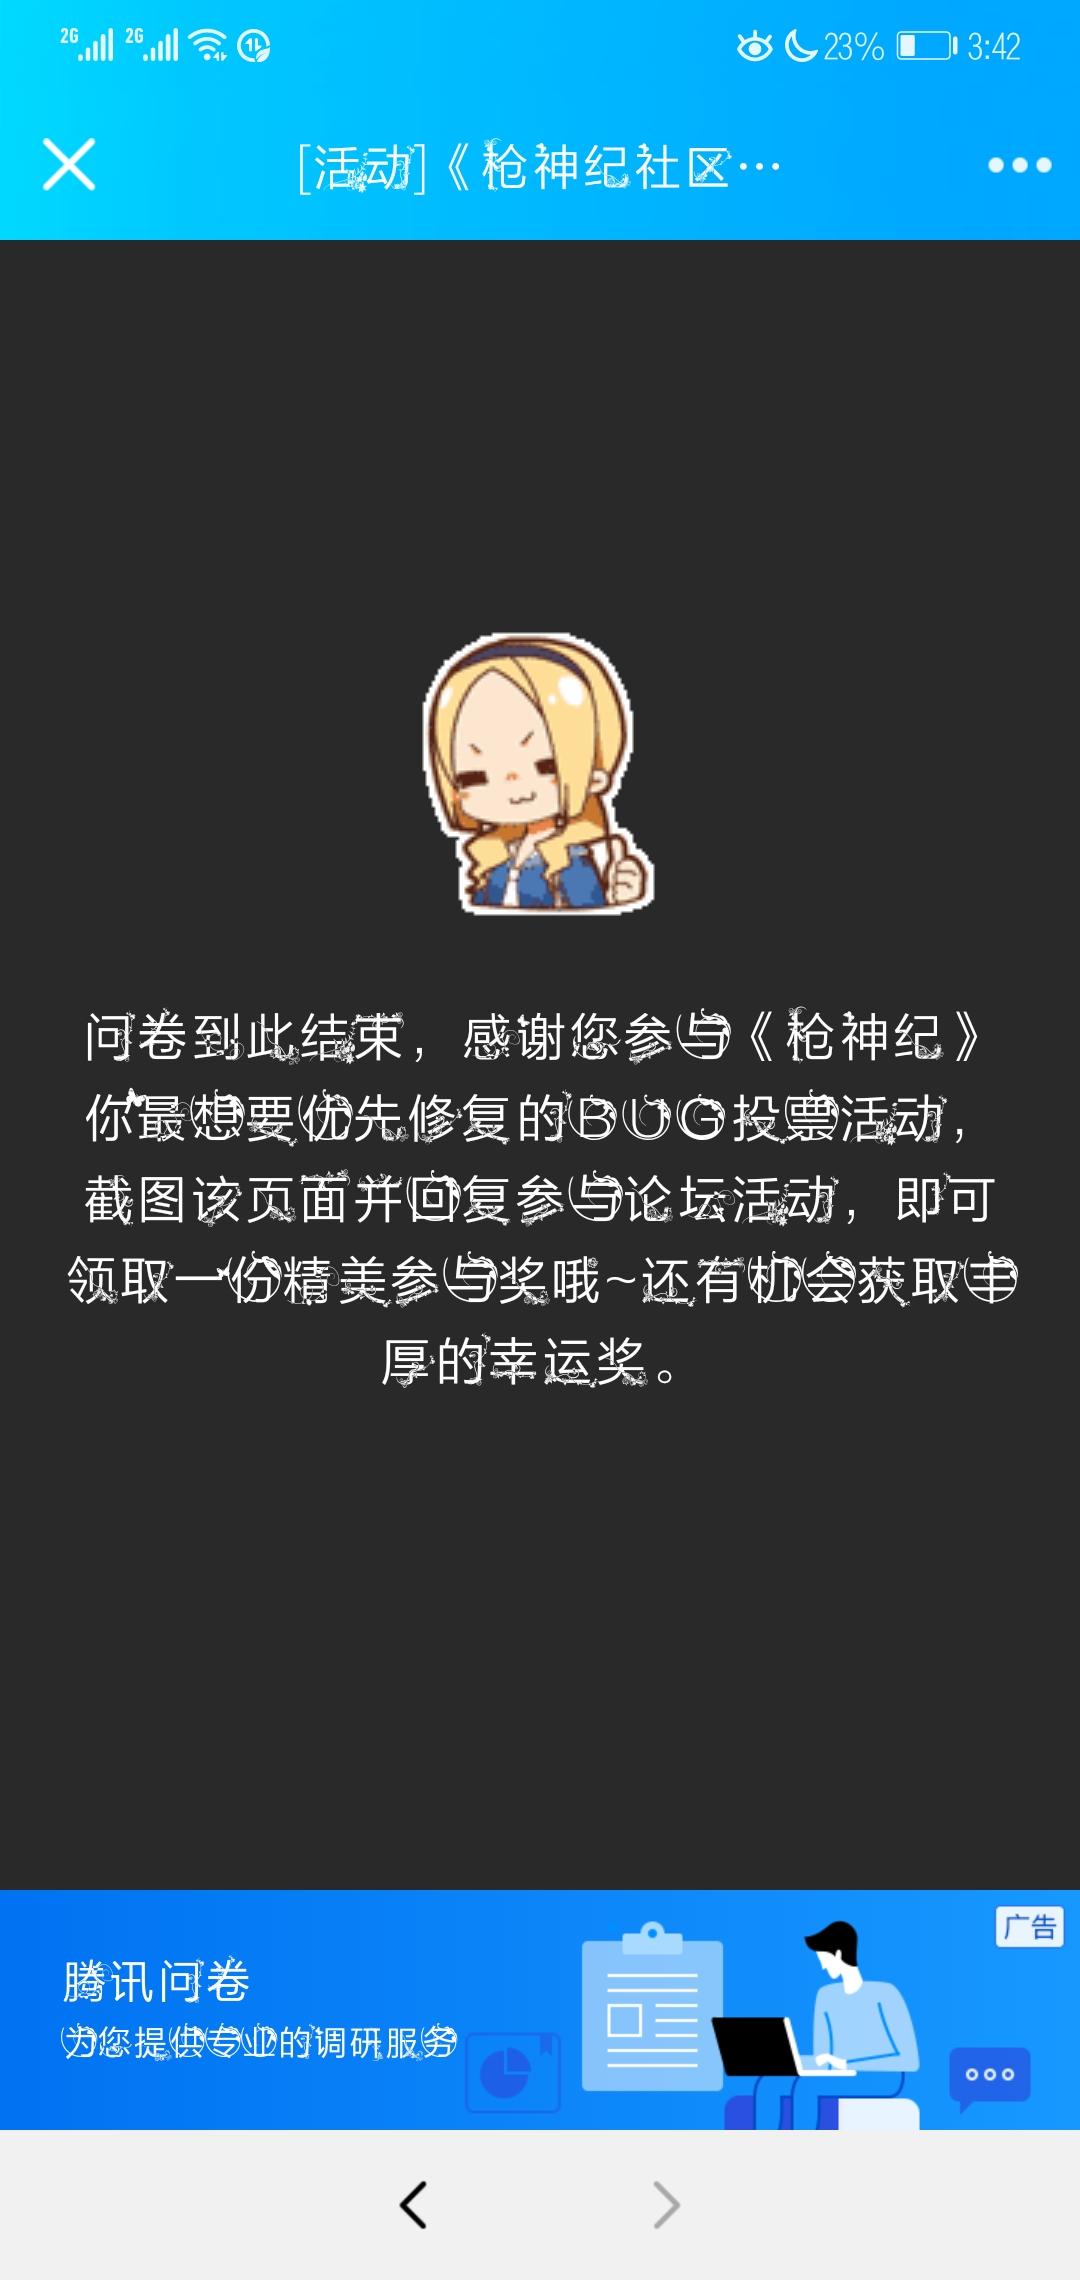 Screenshot_20200310_034202_com.tencent.mobileqq.jpg